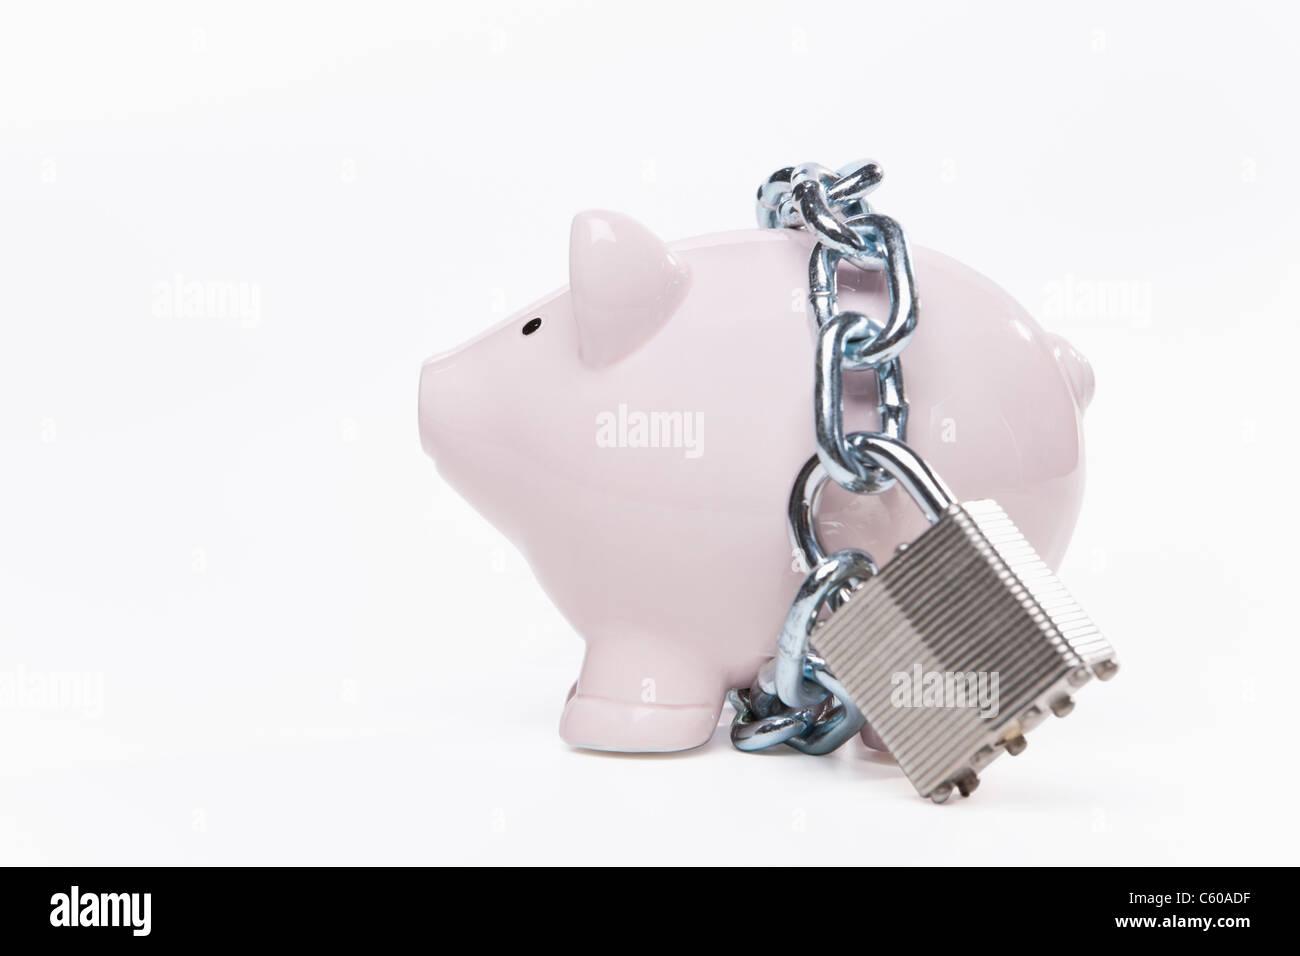 USA, Illinois, Metamora, Padlocked piggy bank Stock Photo